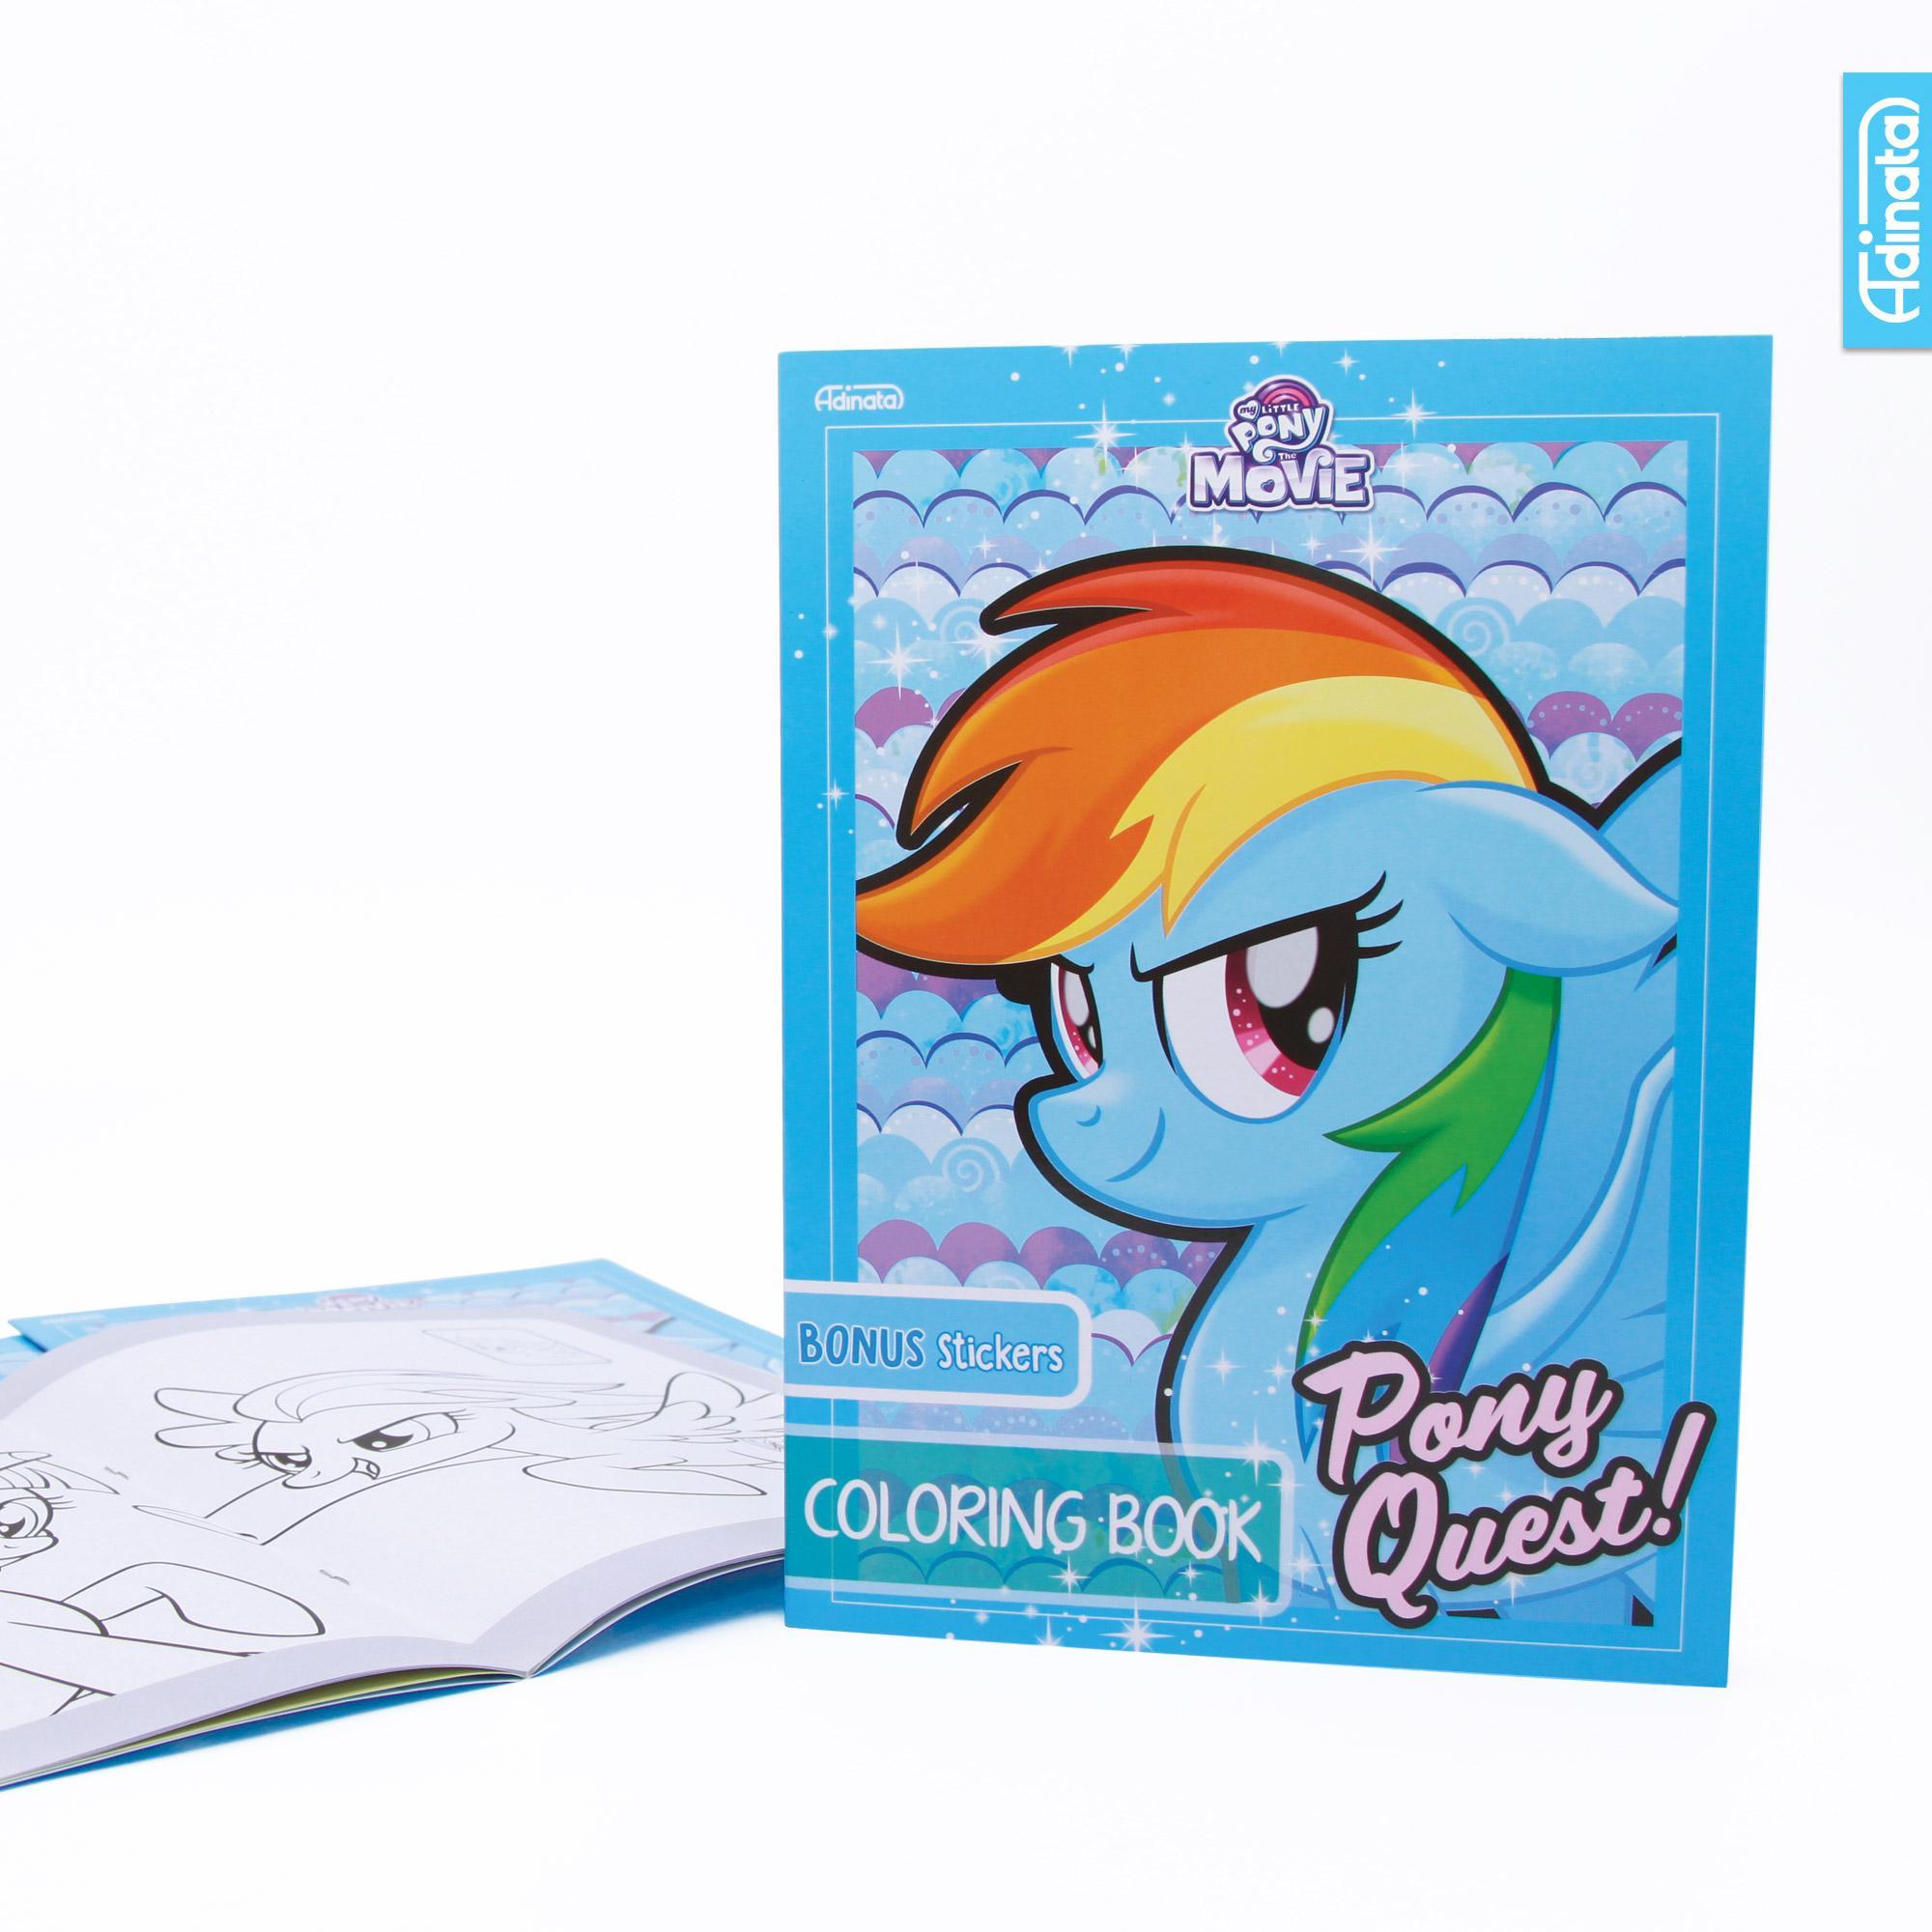 My Little Pony Coloring Book L Adinata / Buku Mewarnai / Buku Anak